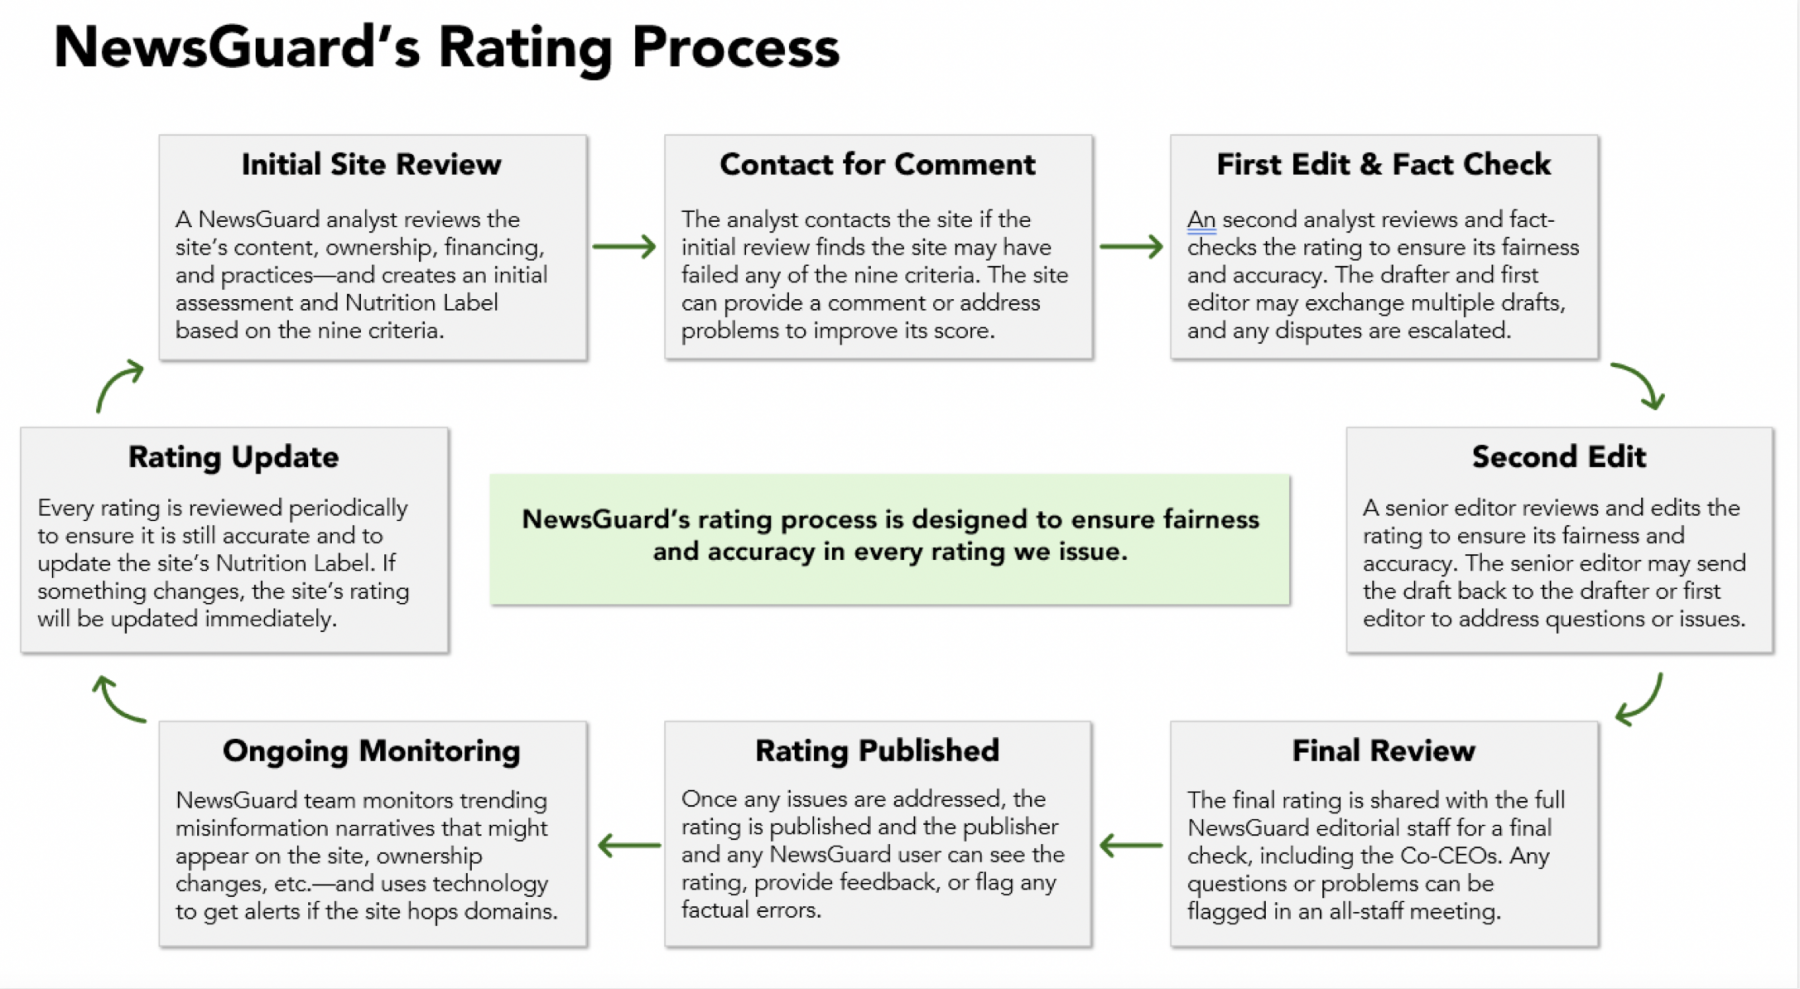 NewsGuard's Rating Process